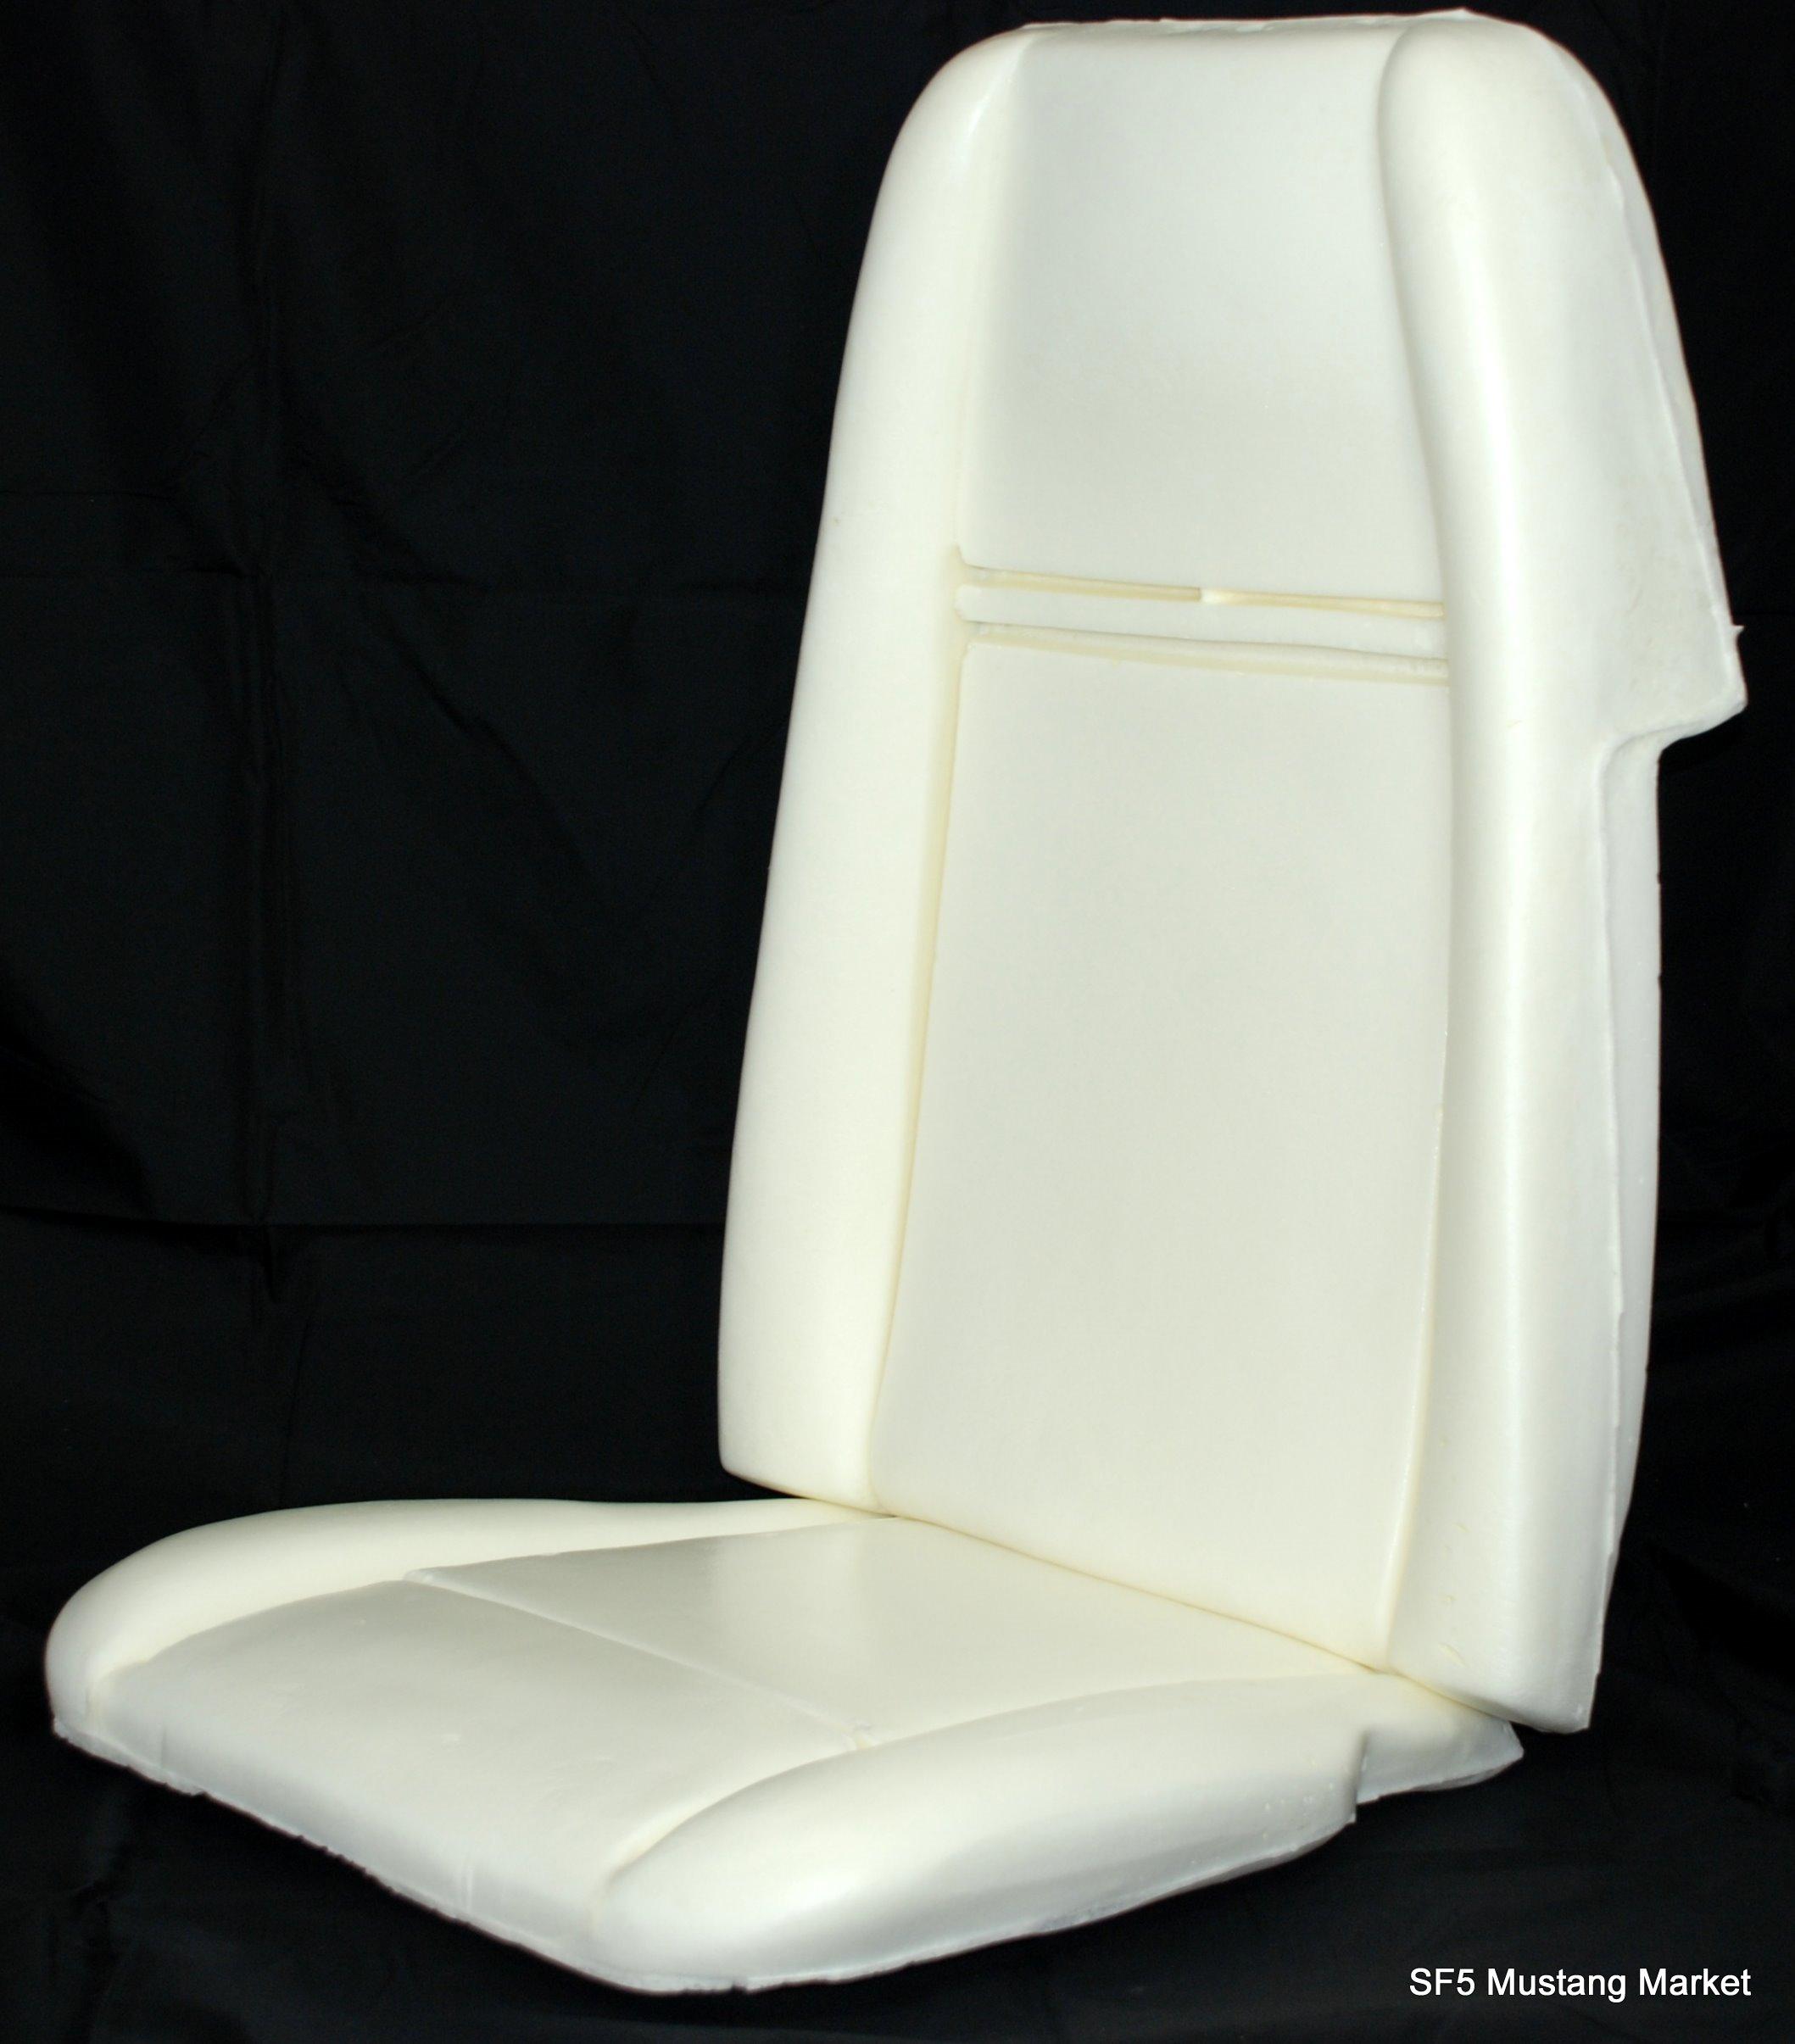 1969-70 Mach 1 hi back Seat Foam made by Mustang Market